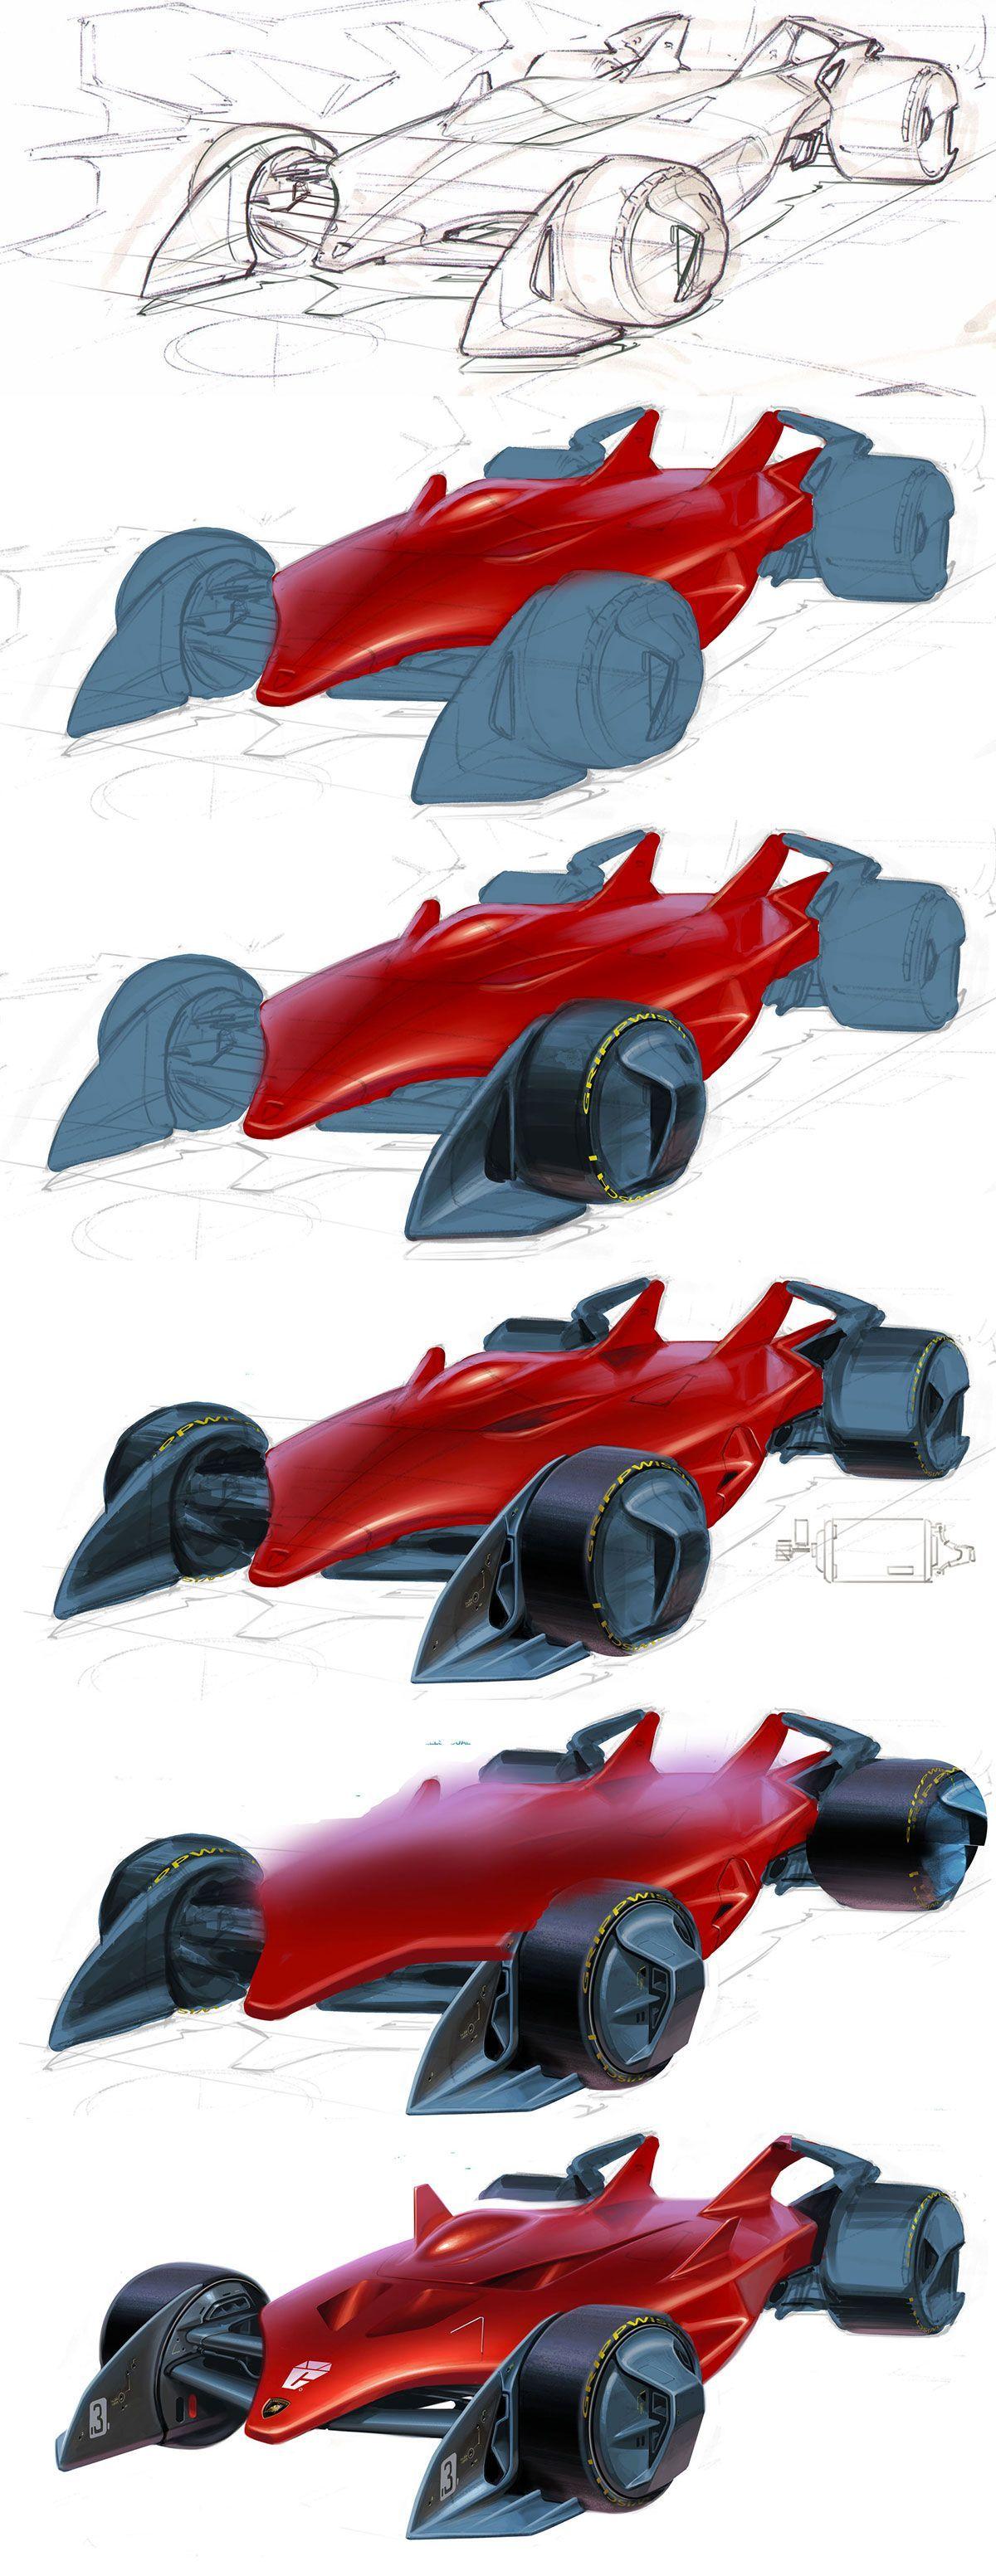 Interview with vehicle designer John Frye